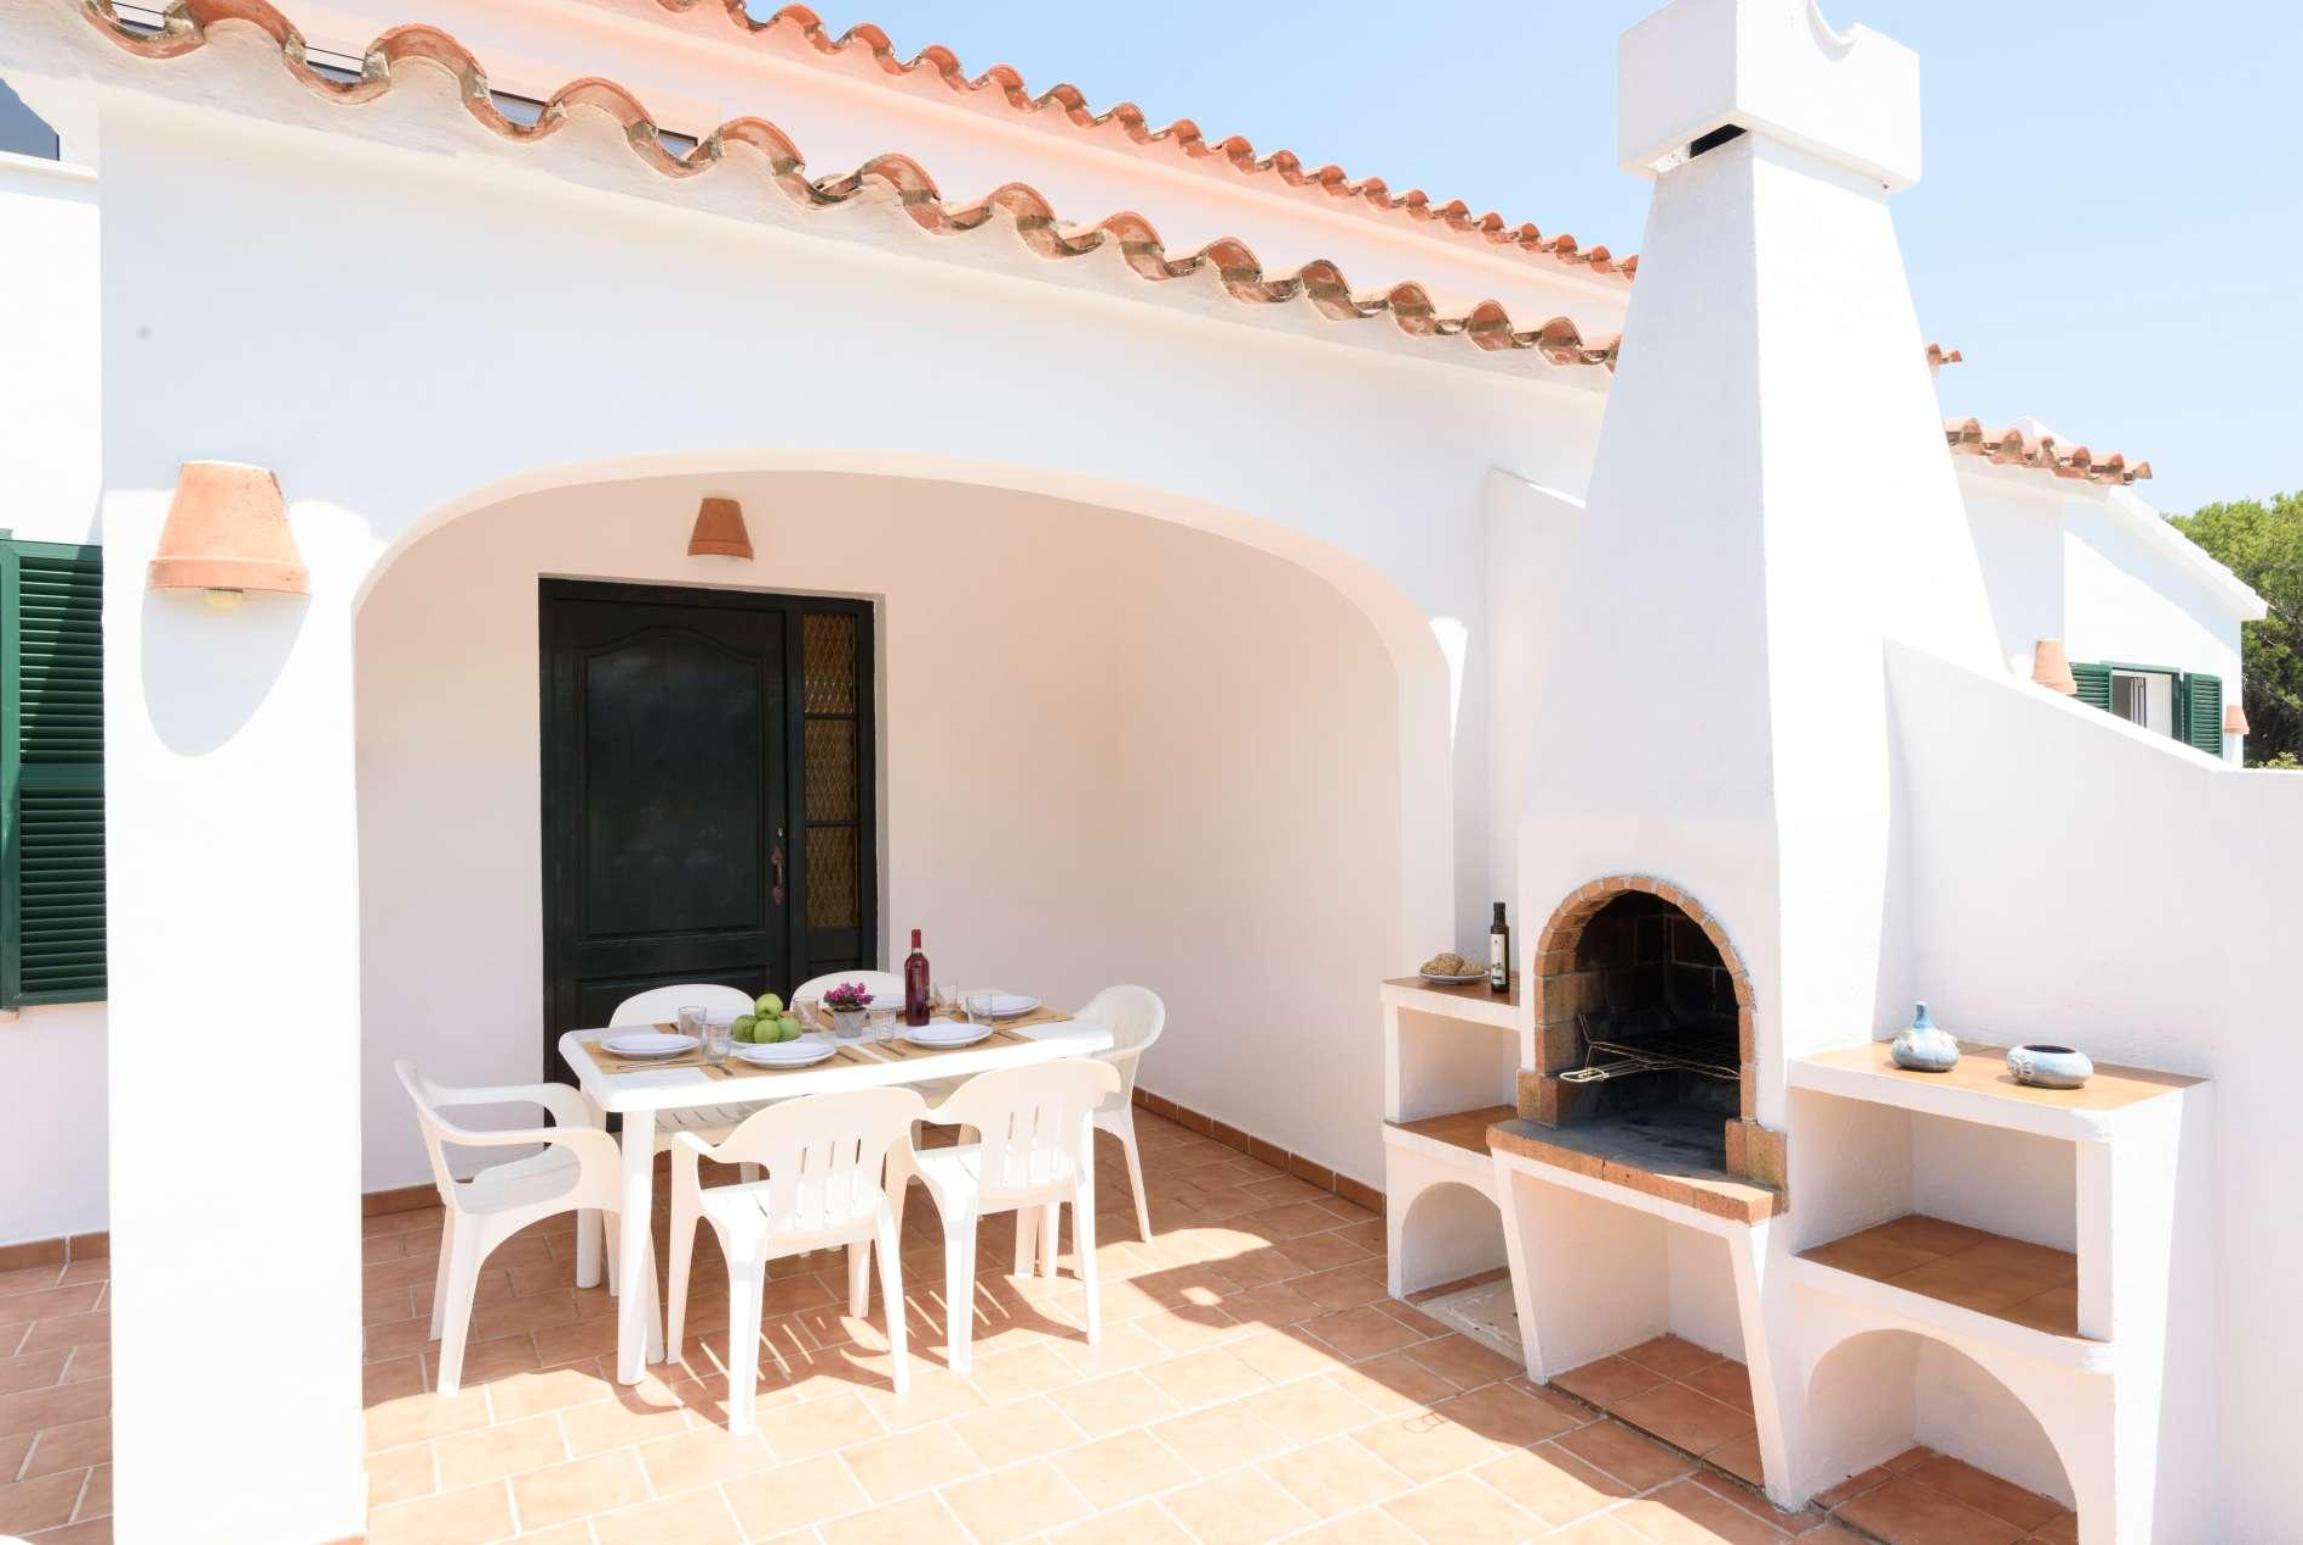 Ferienhaus Eulalia II (2653368), Arenal De'N Castell, Menorca, Balearische Inseln, Spanien, Bild 13